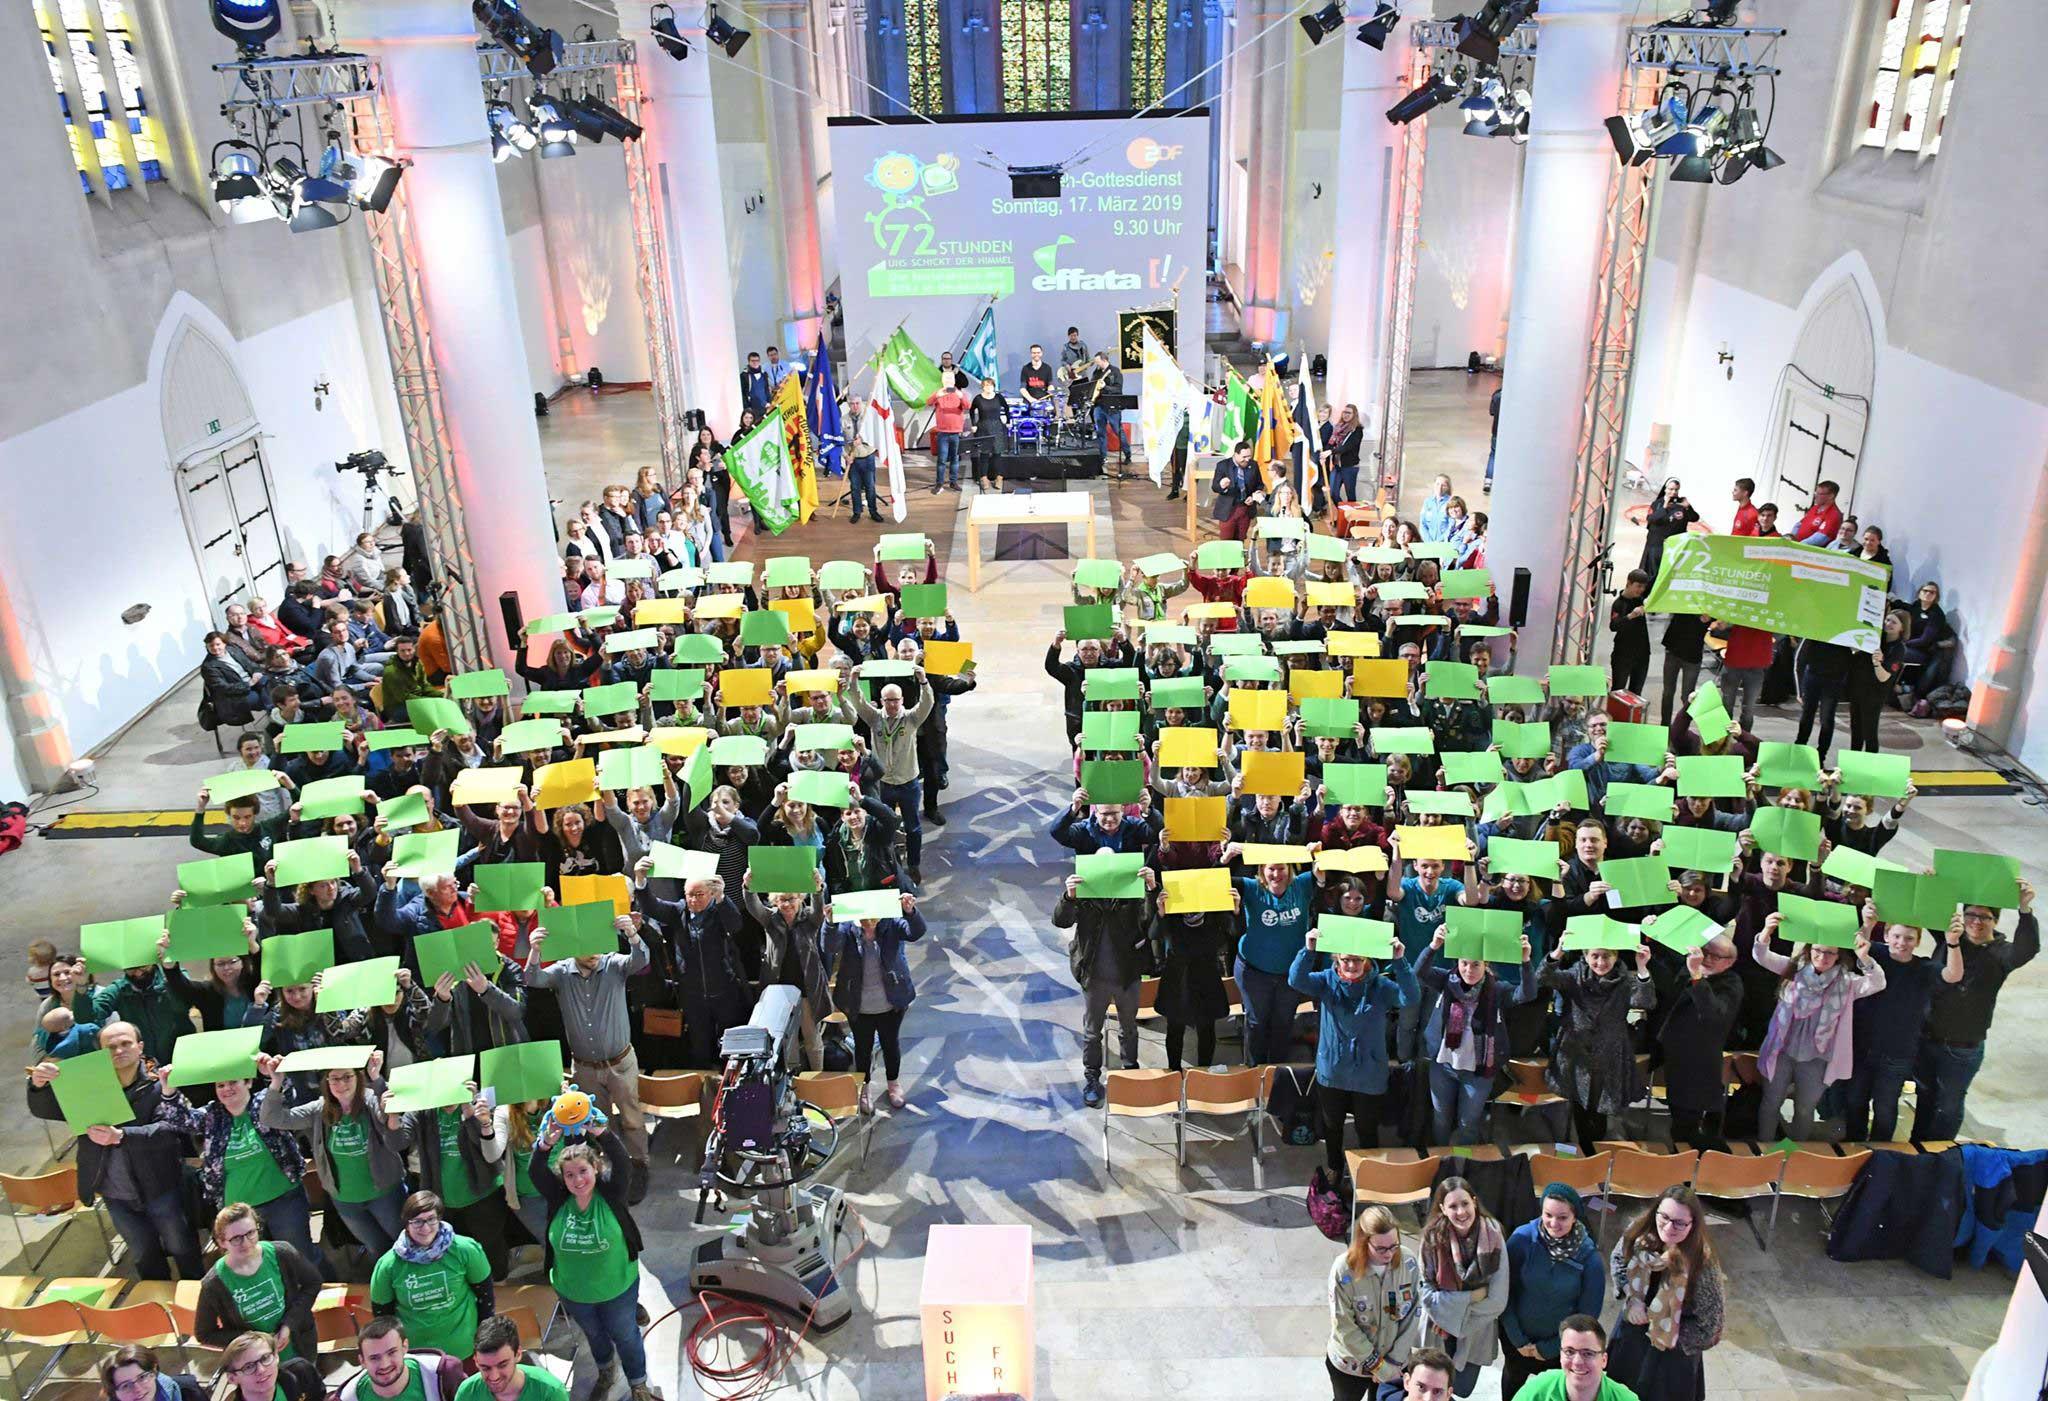 Bildquelle: BDKJ-Bundesstelle / Christian Schnaubelt